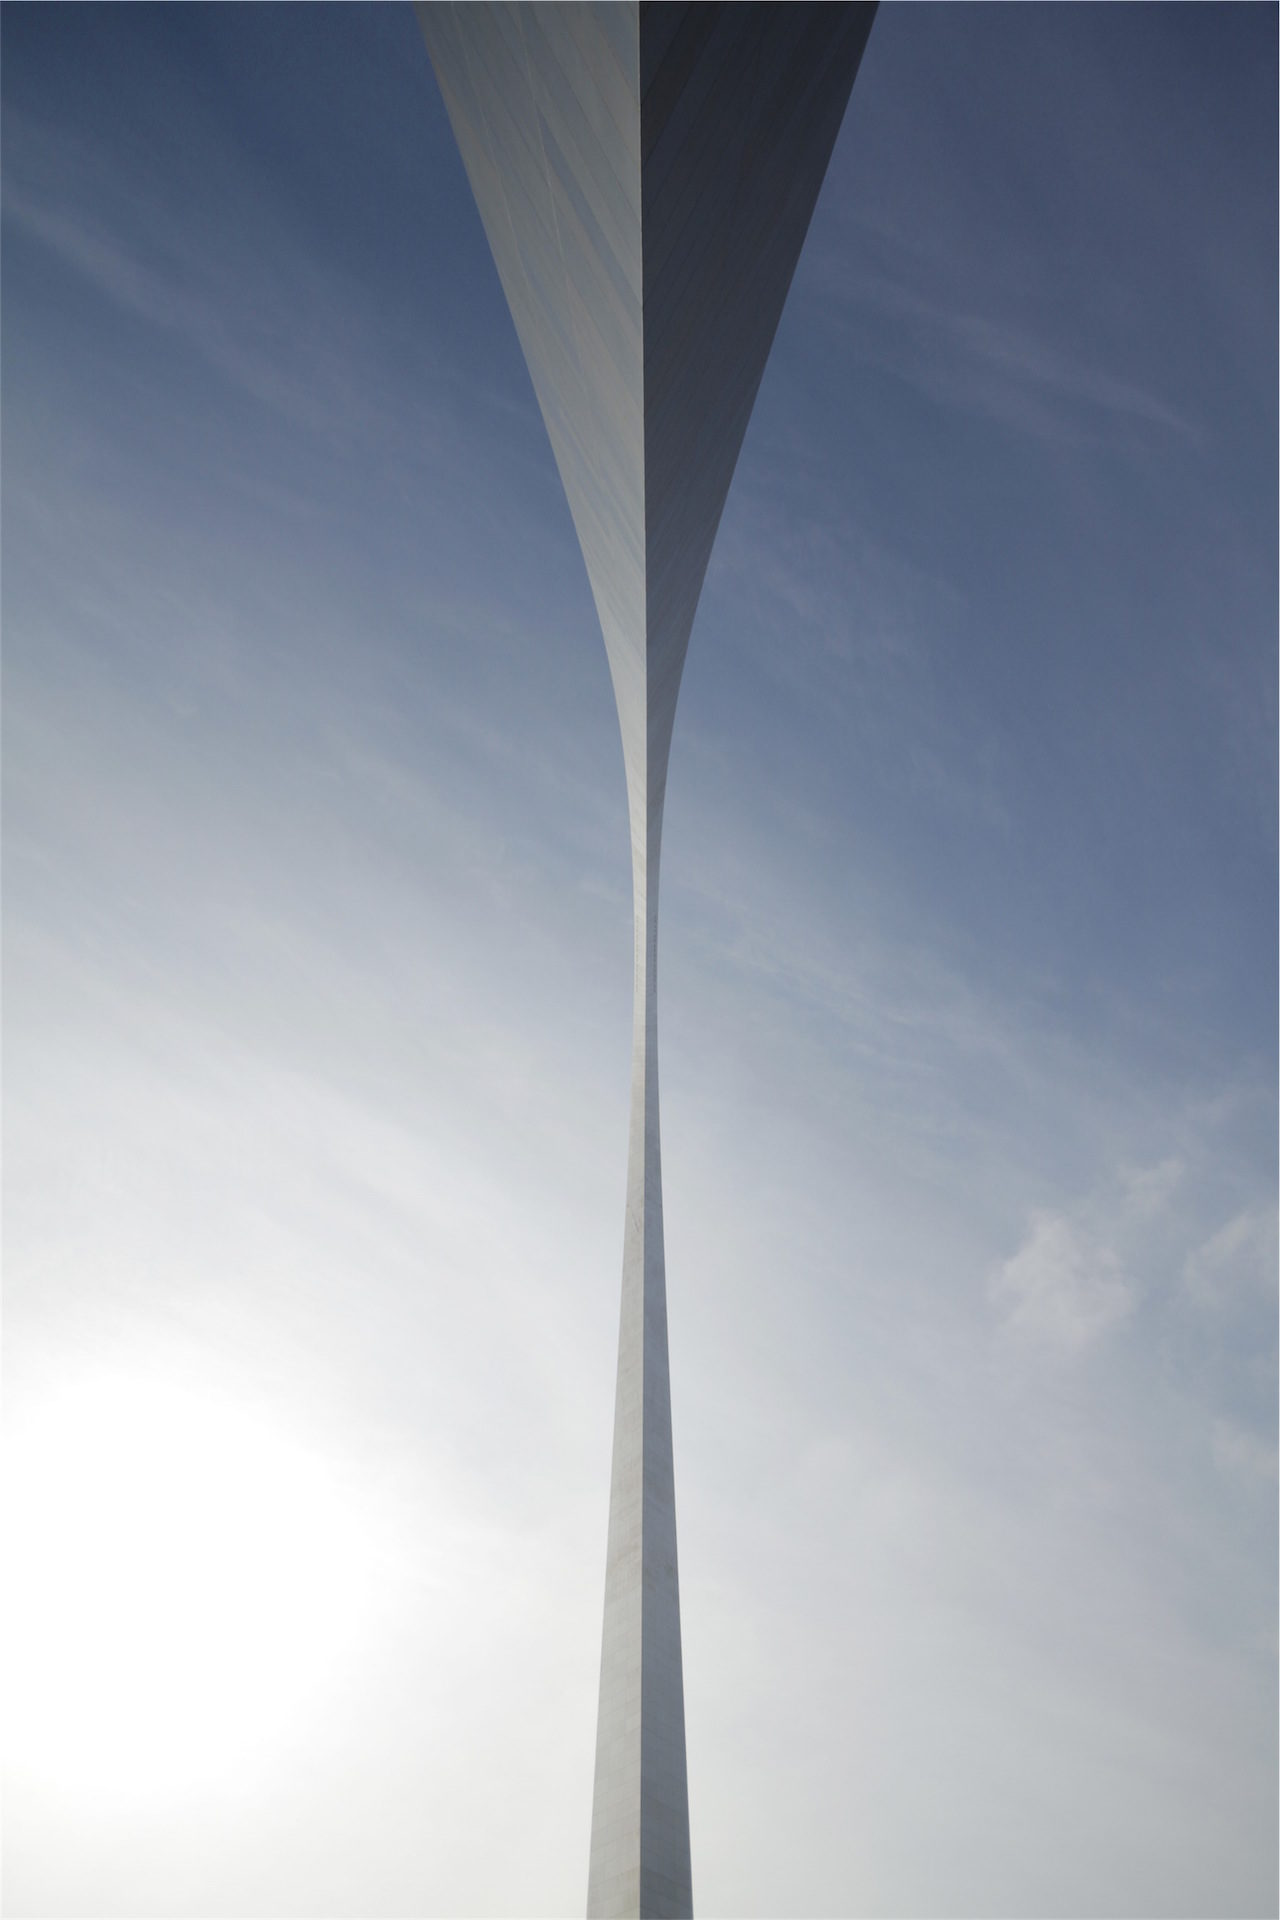 puerte, 电弧, 建设, 天空, 太阳 - 高清壁纸 - 教授-falken.com